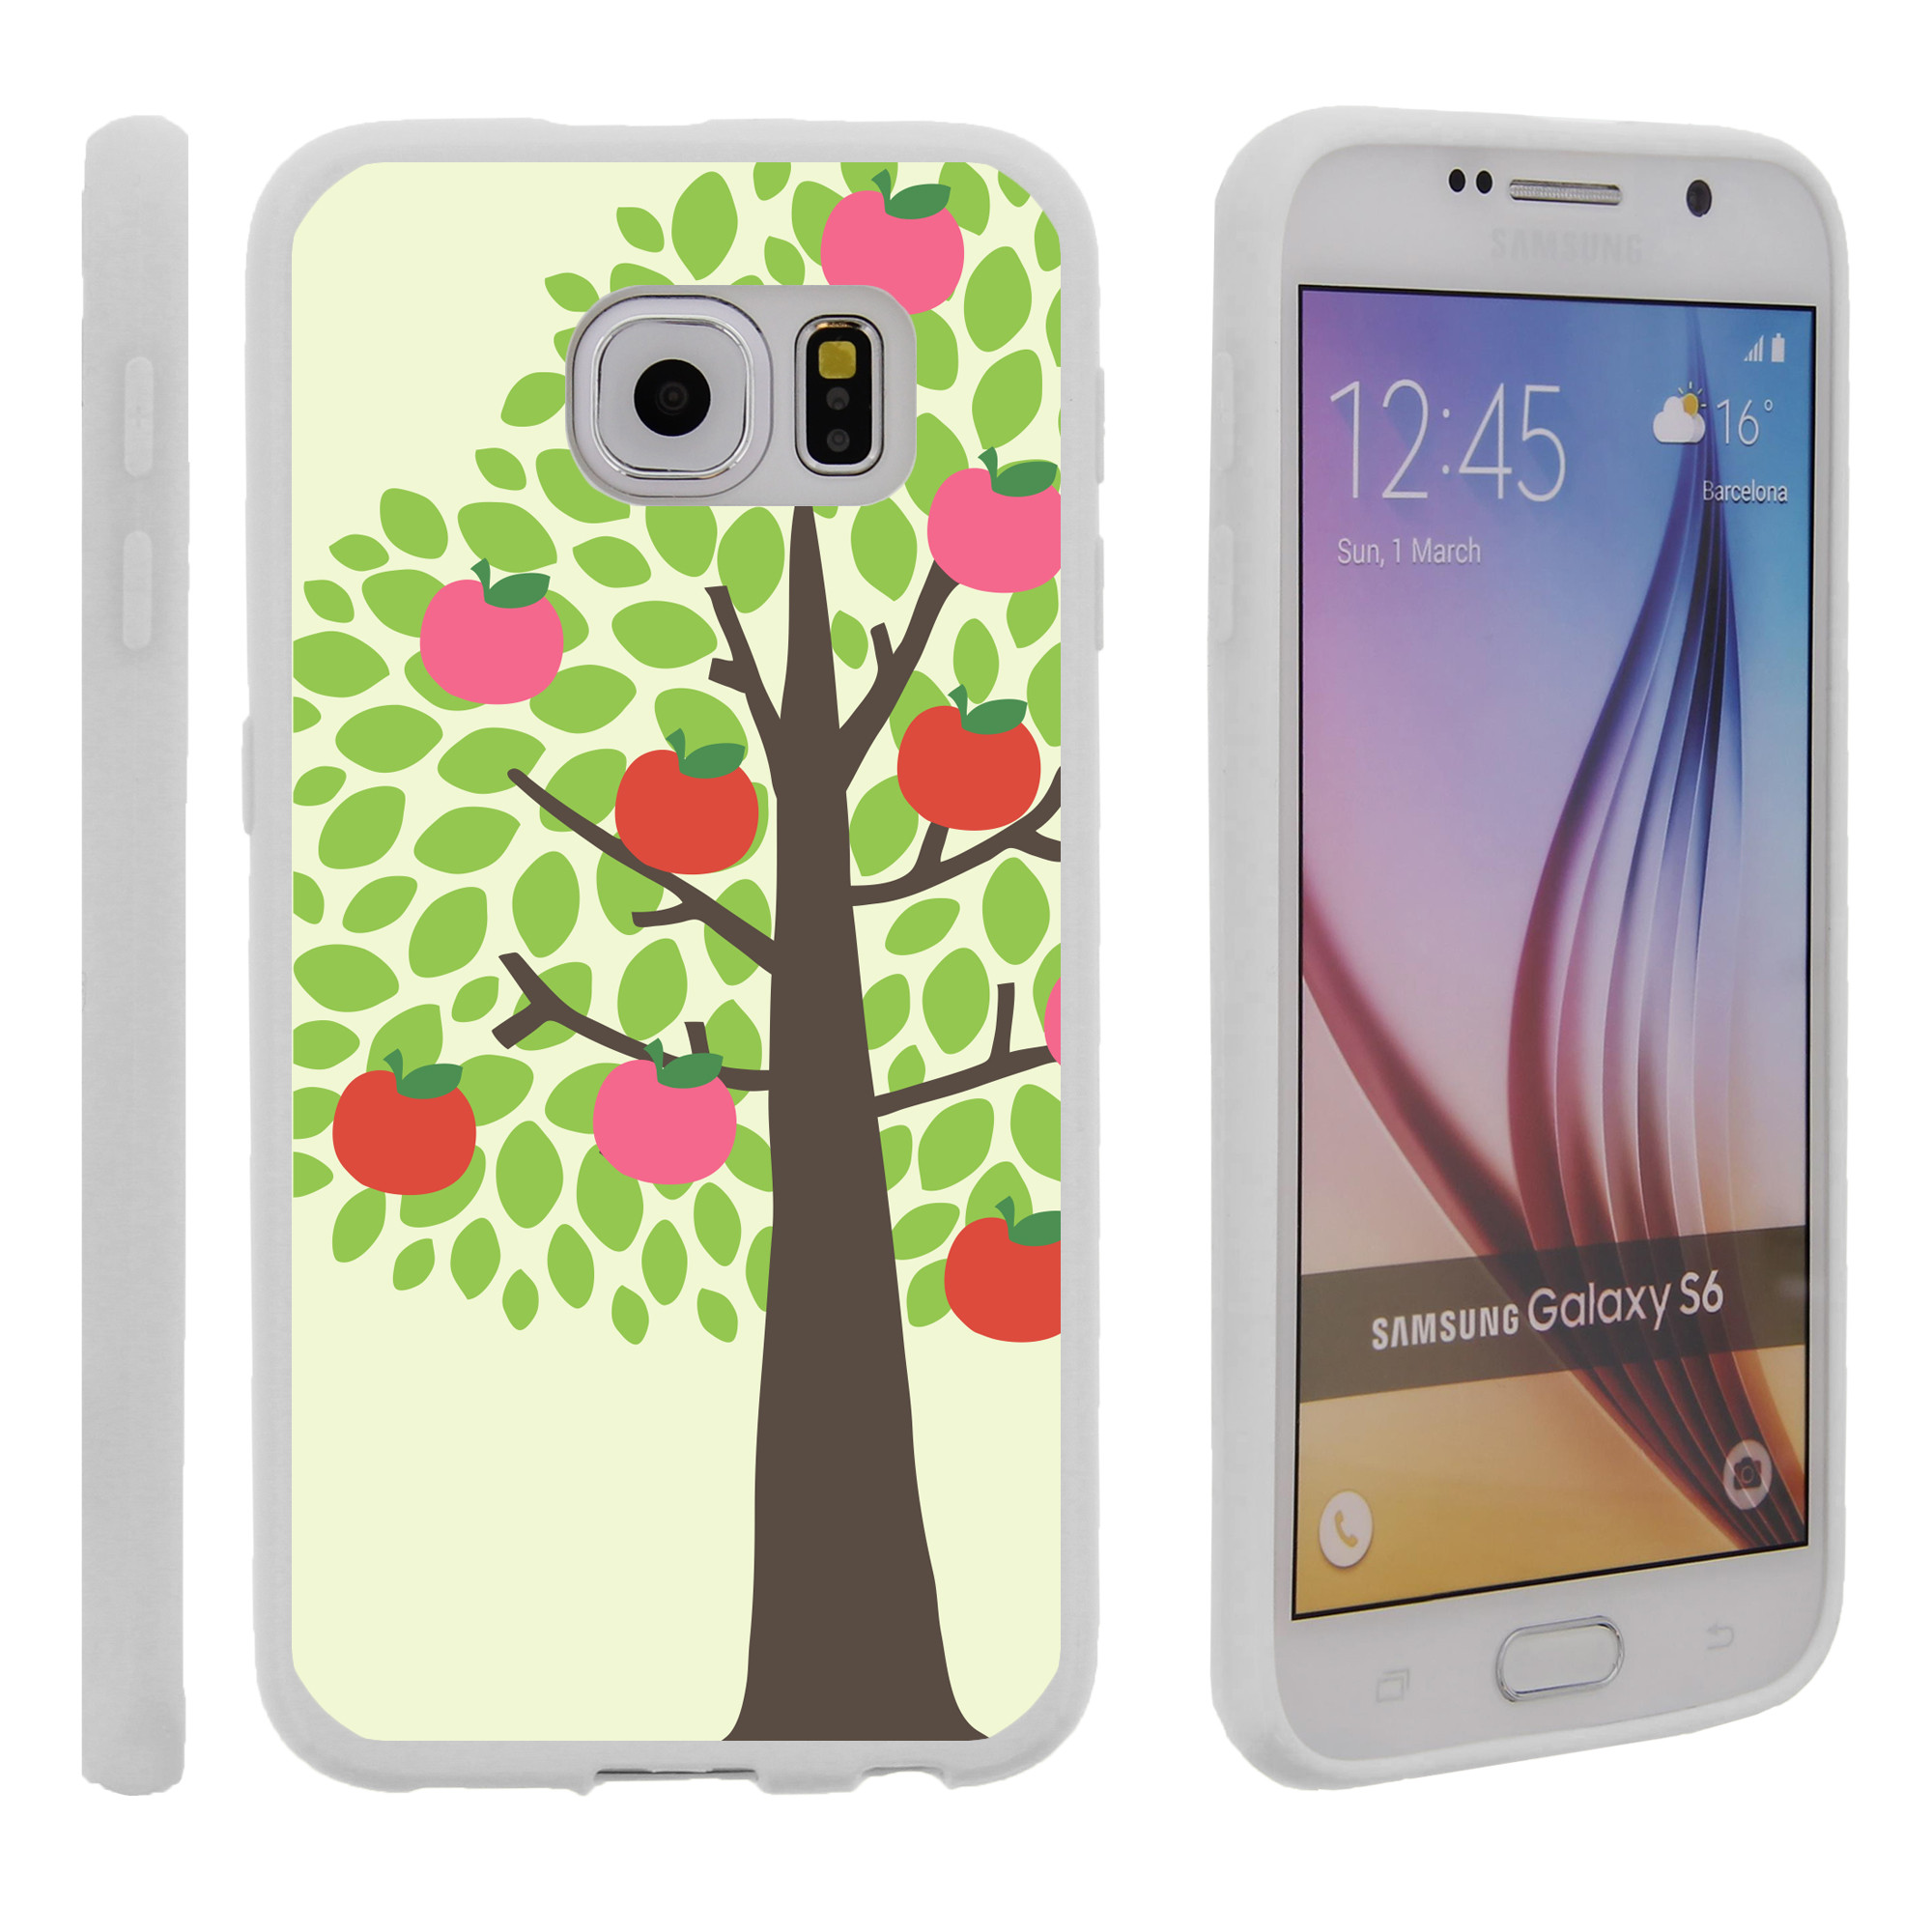 Samsung Galaxy S6 G920, Flexible Case [FLEX FORCE] Slim Durable TPU Sleek Bumper with Unique Designs - Apple Tree